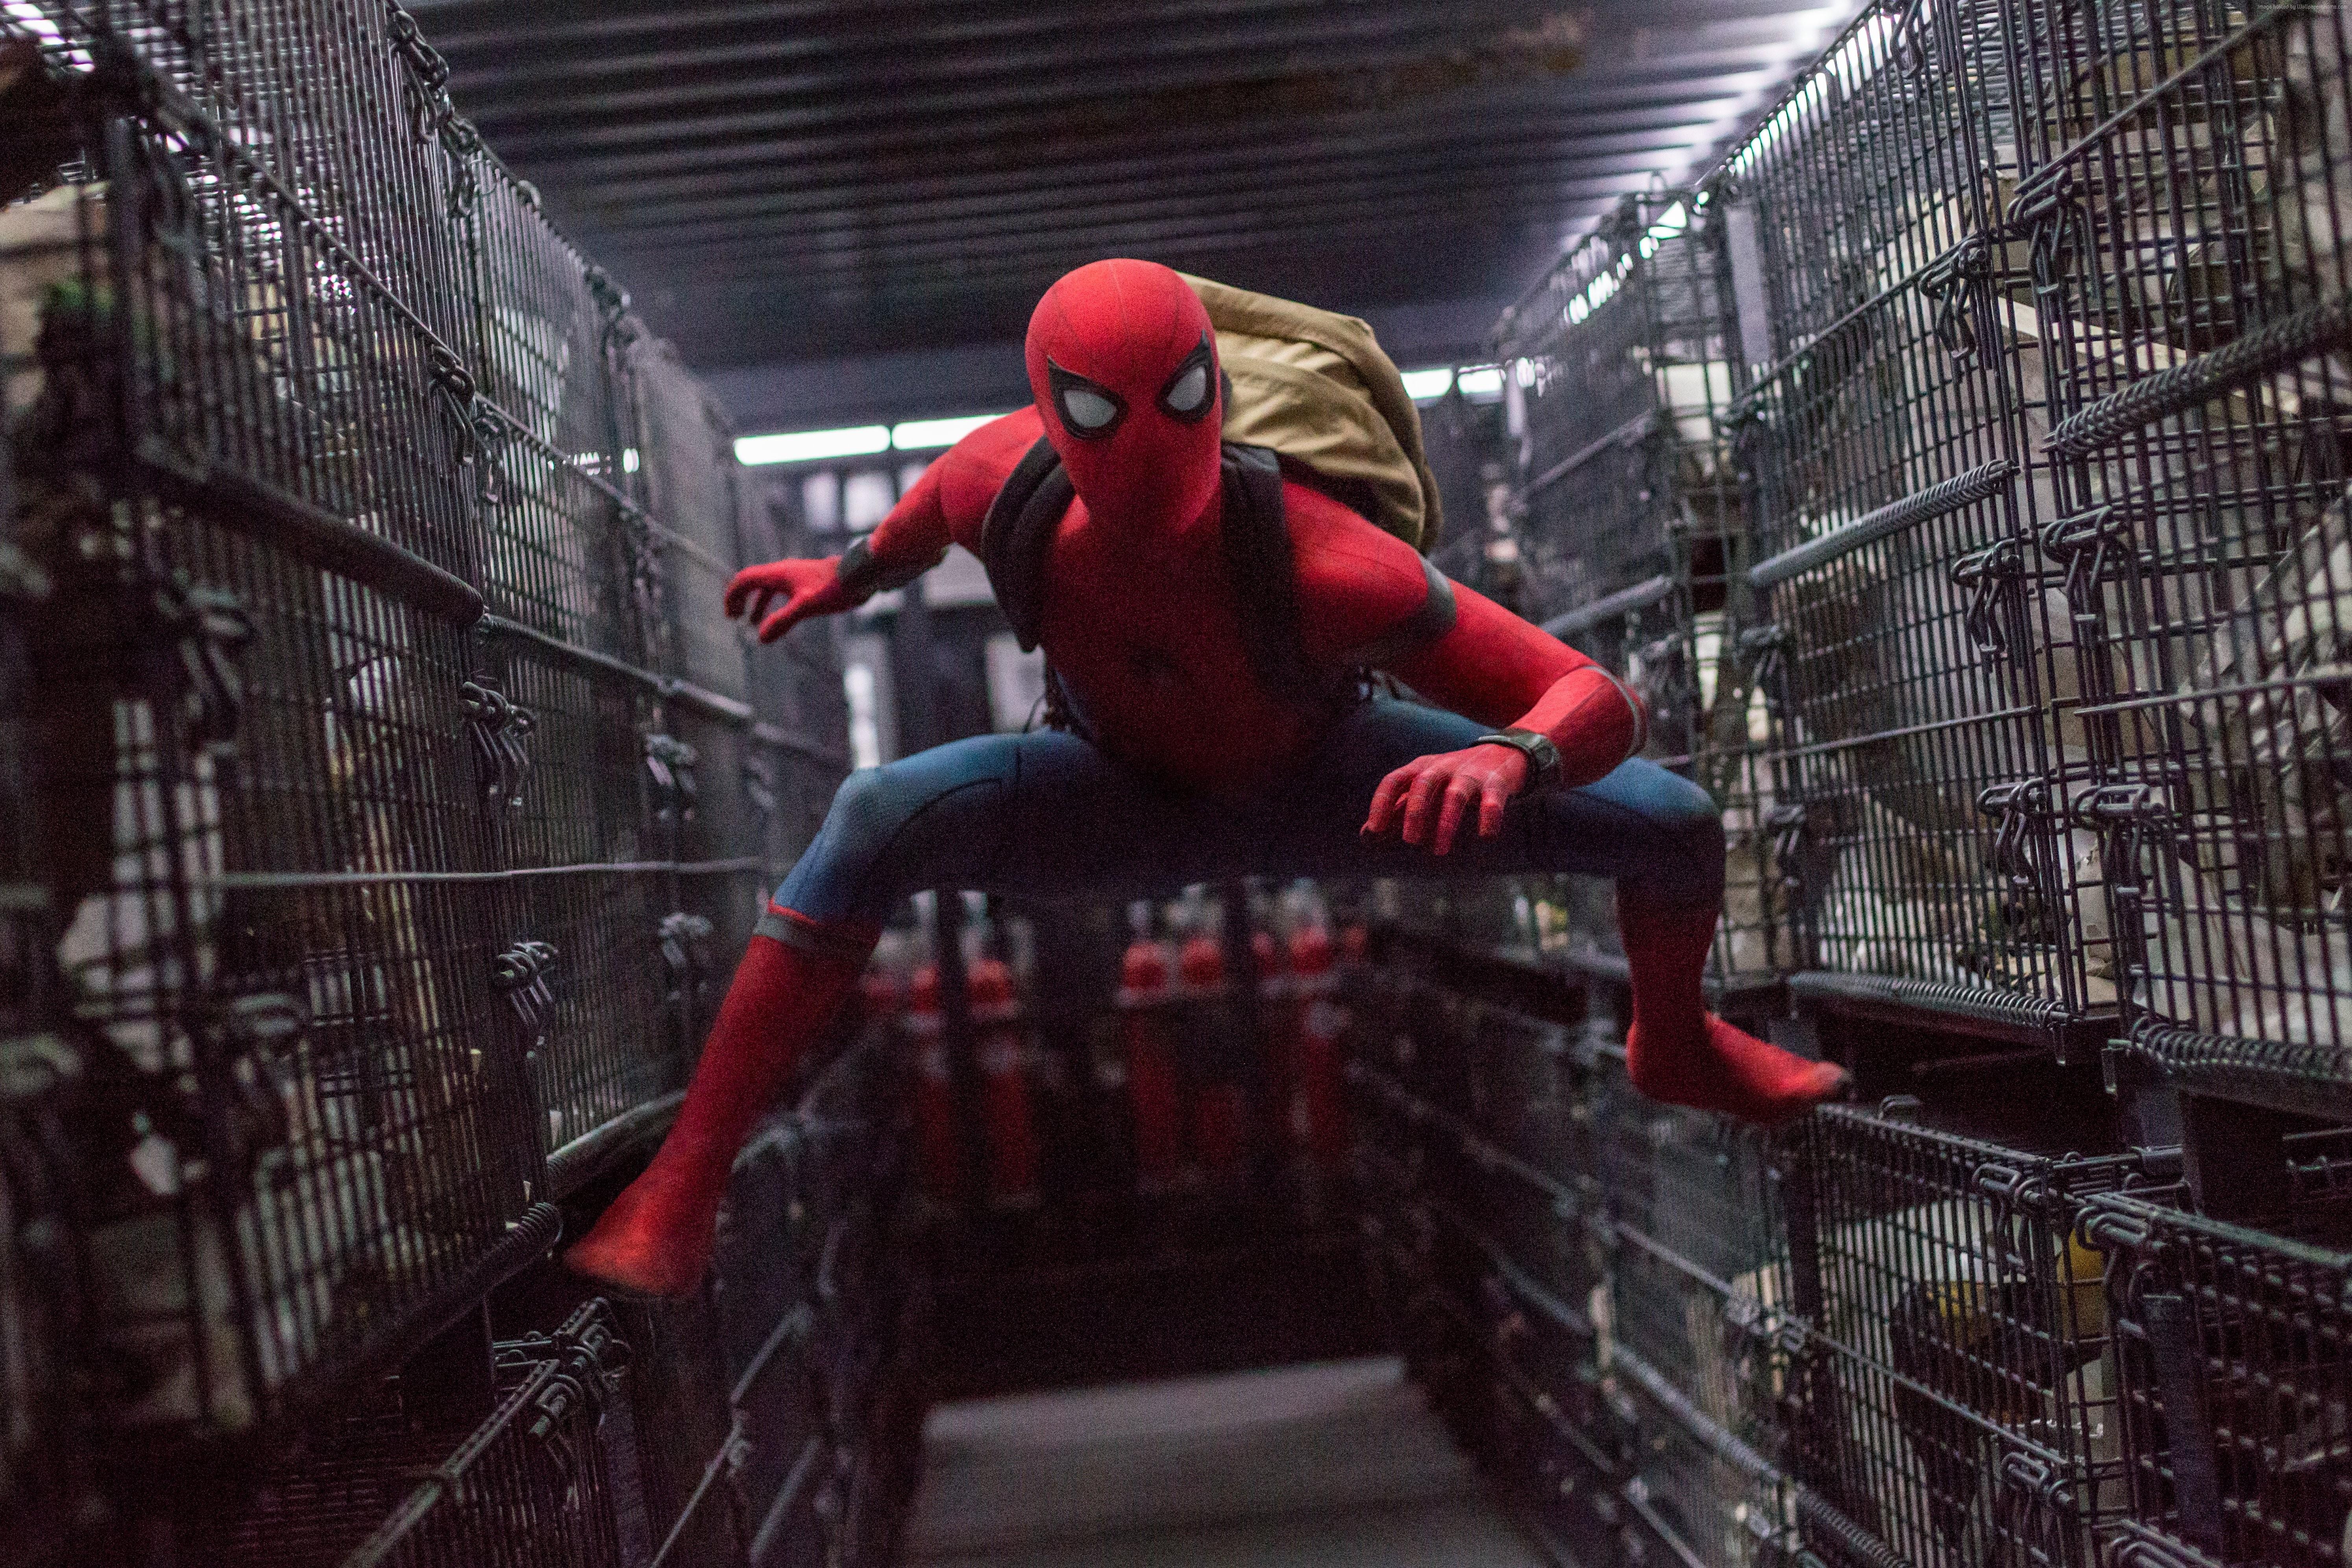 105648 Marvel Spider Man Homecoming Tom Holland 4k 8k 5976x3984